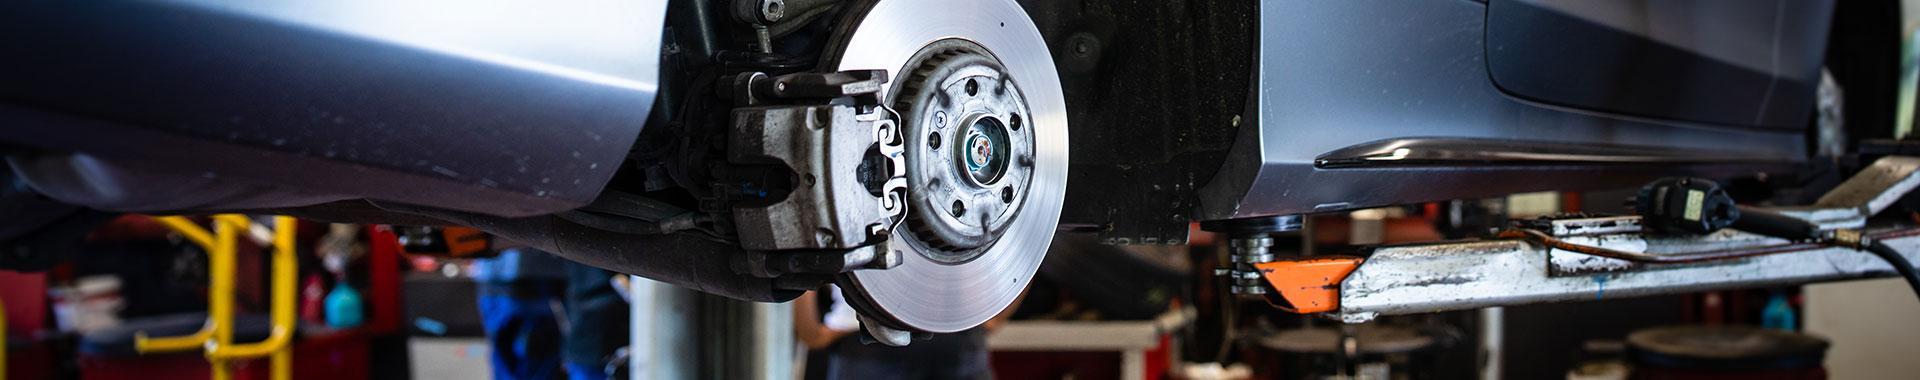 What Happens When A Wheel Bearing Fails?